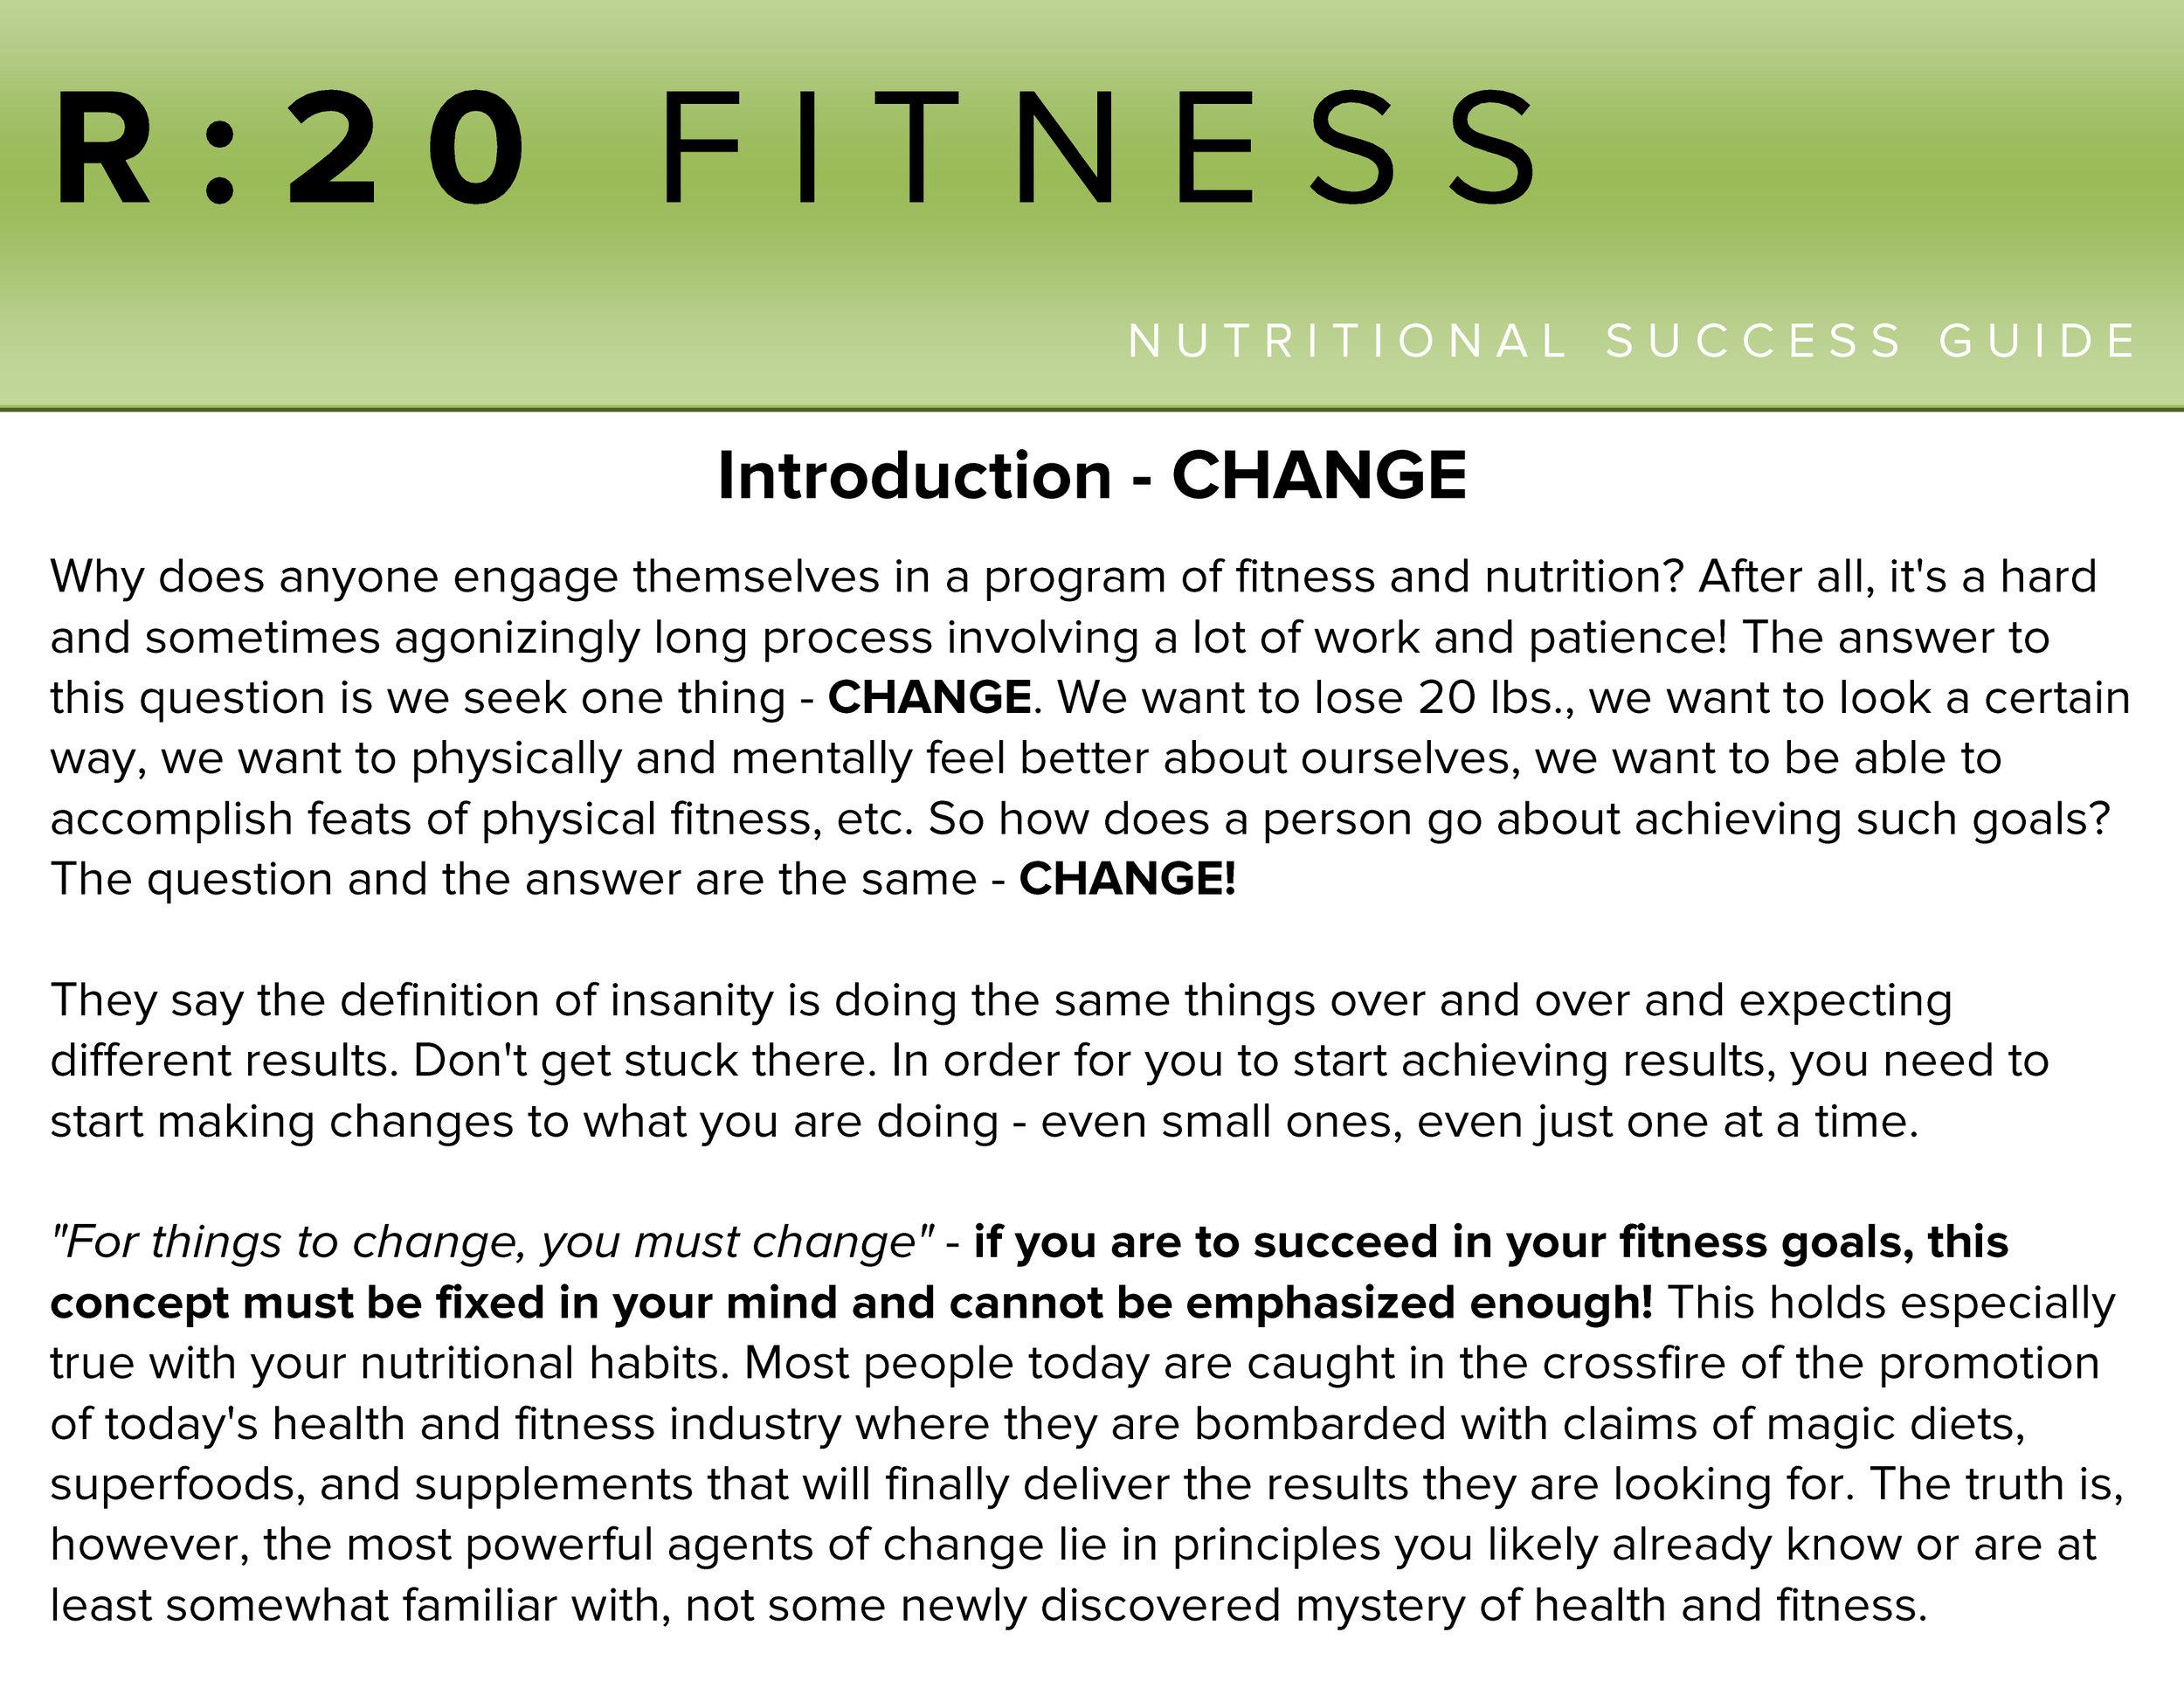 R20 1.0 Nutritional Success Guide-1.jpg